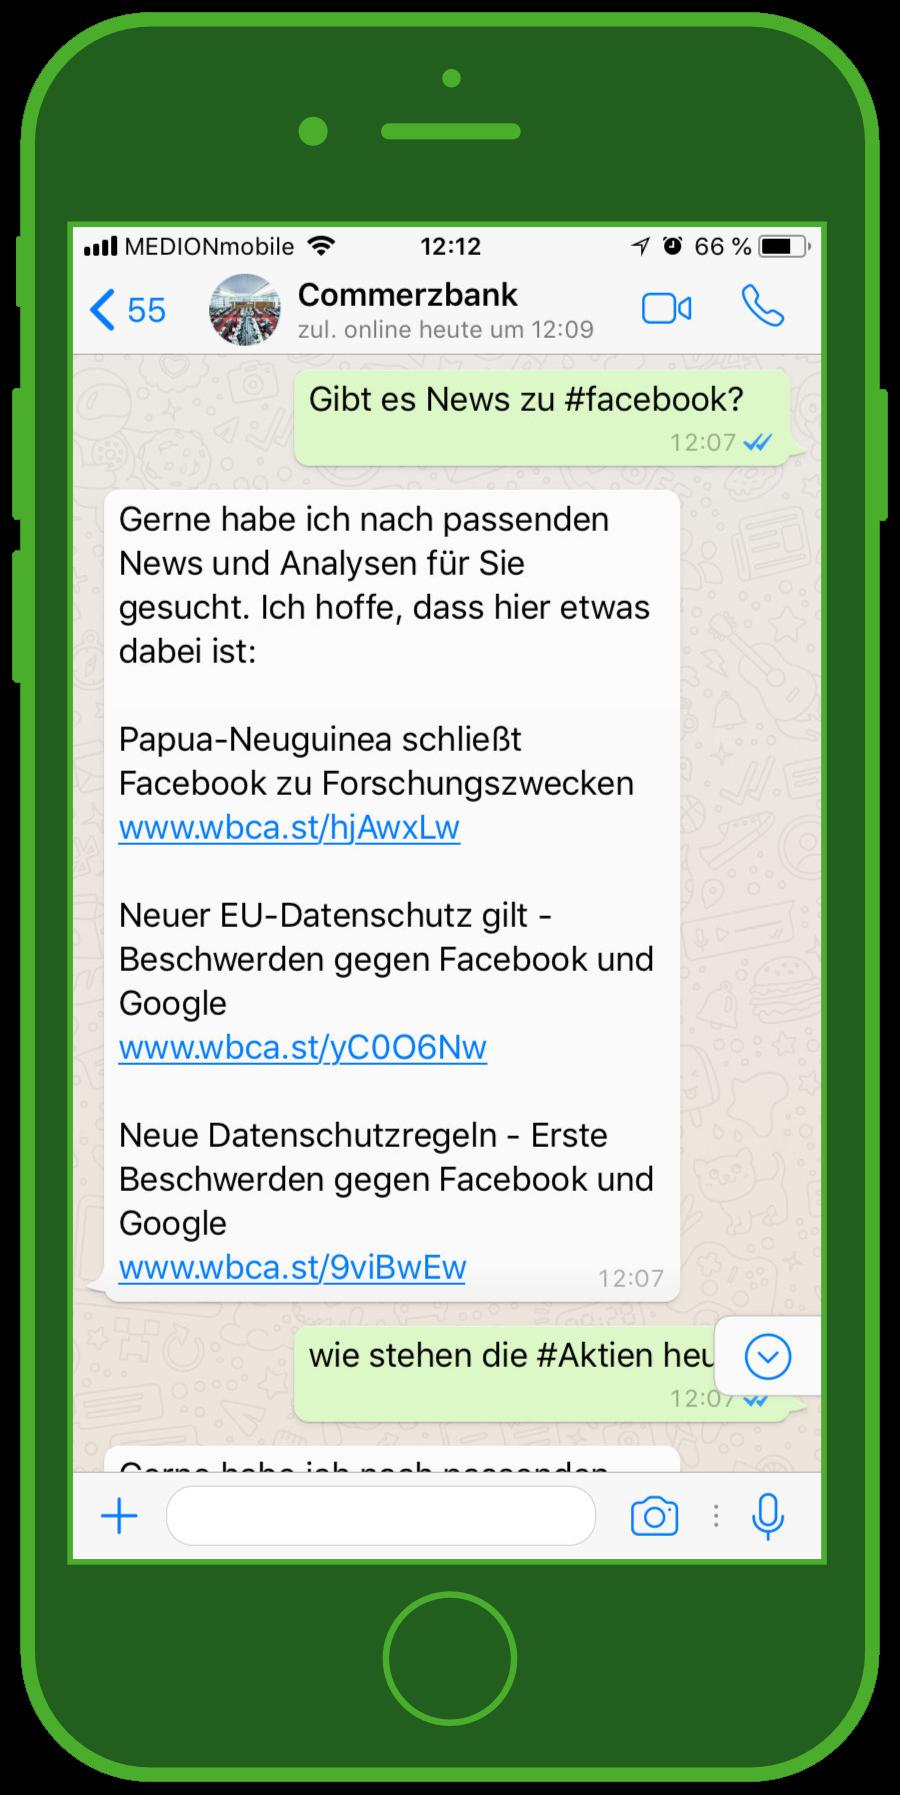 device-commerzbak-bot-1